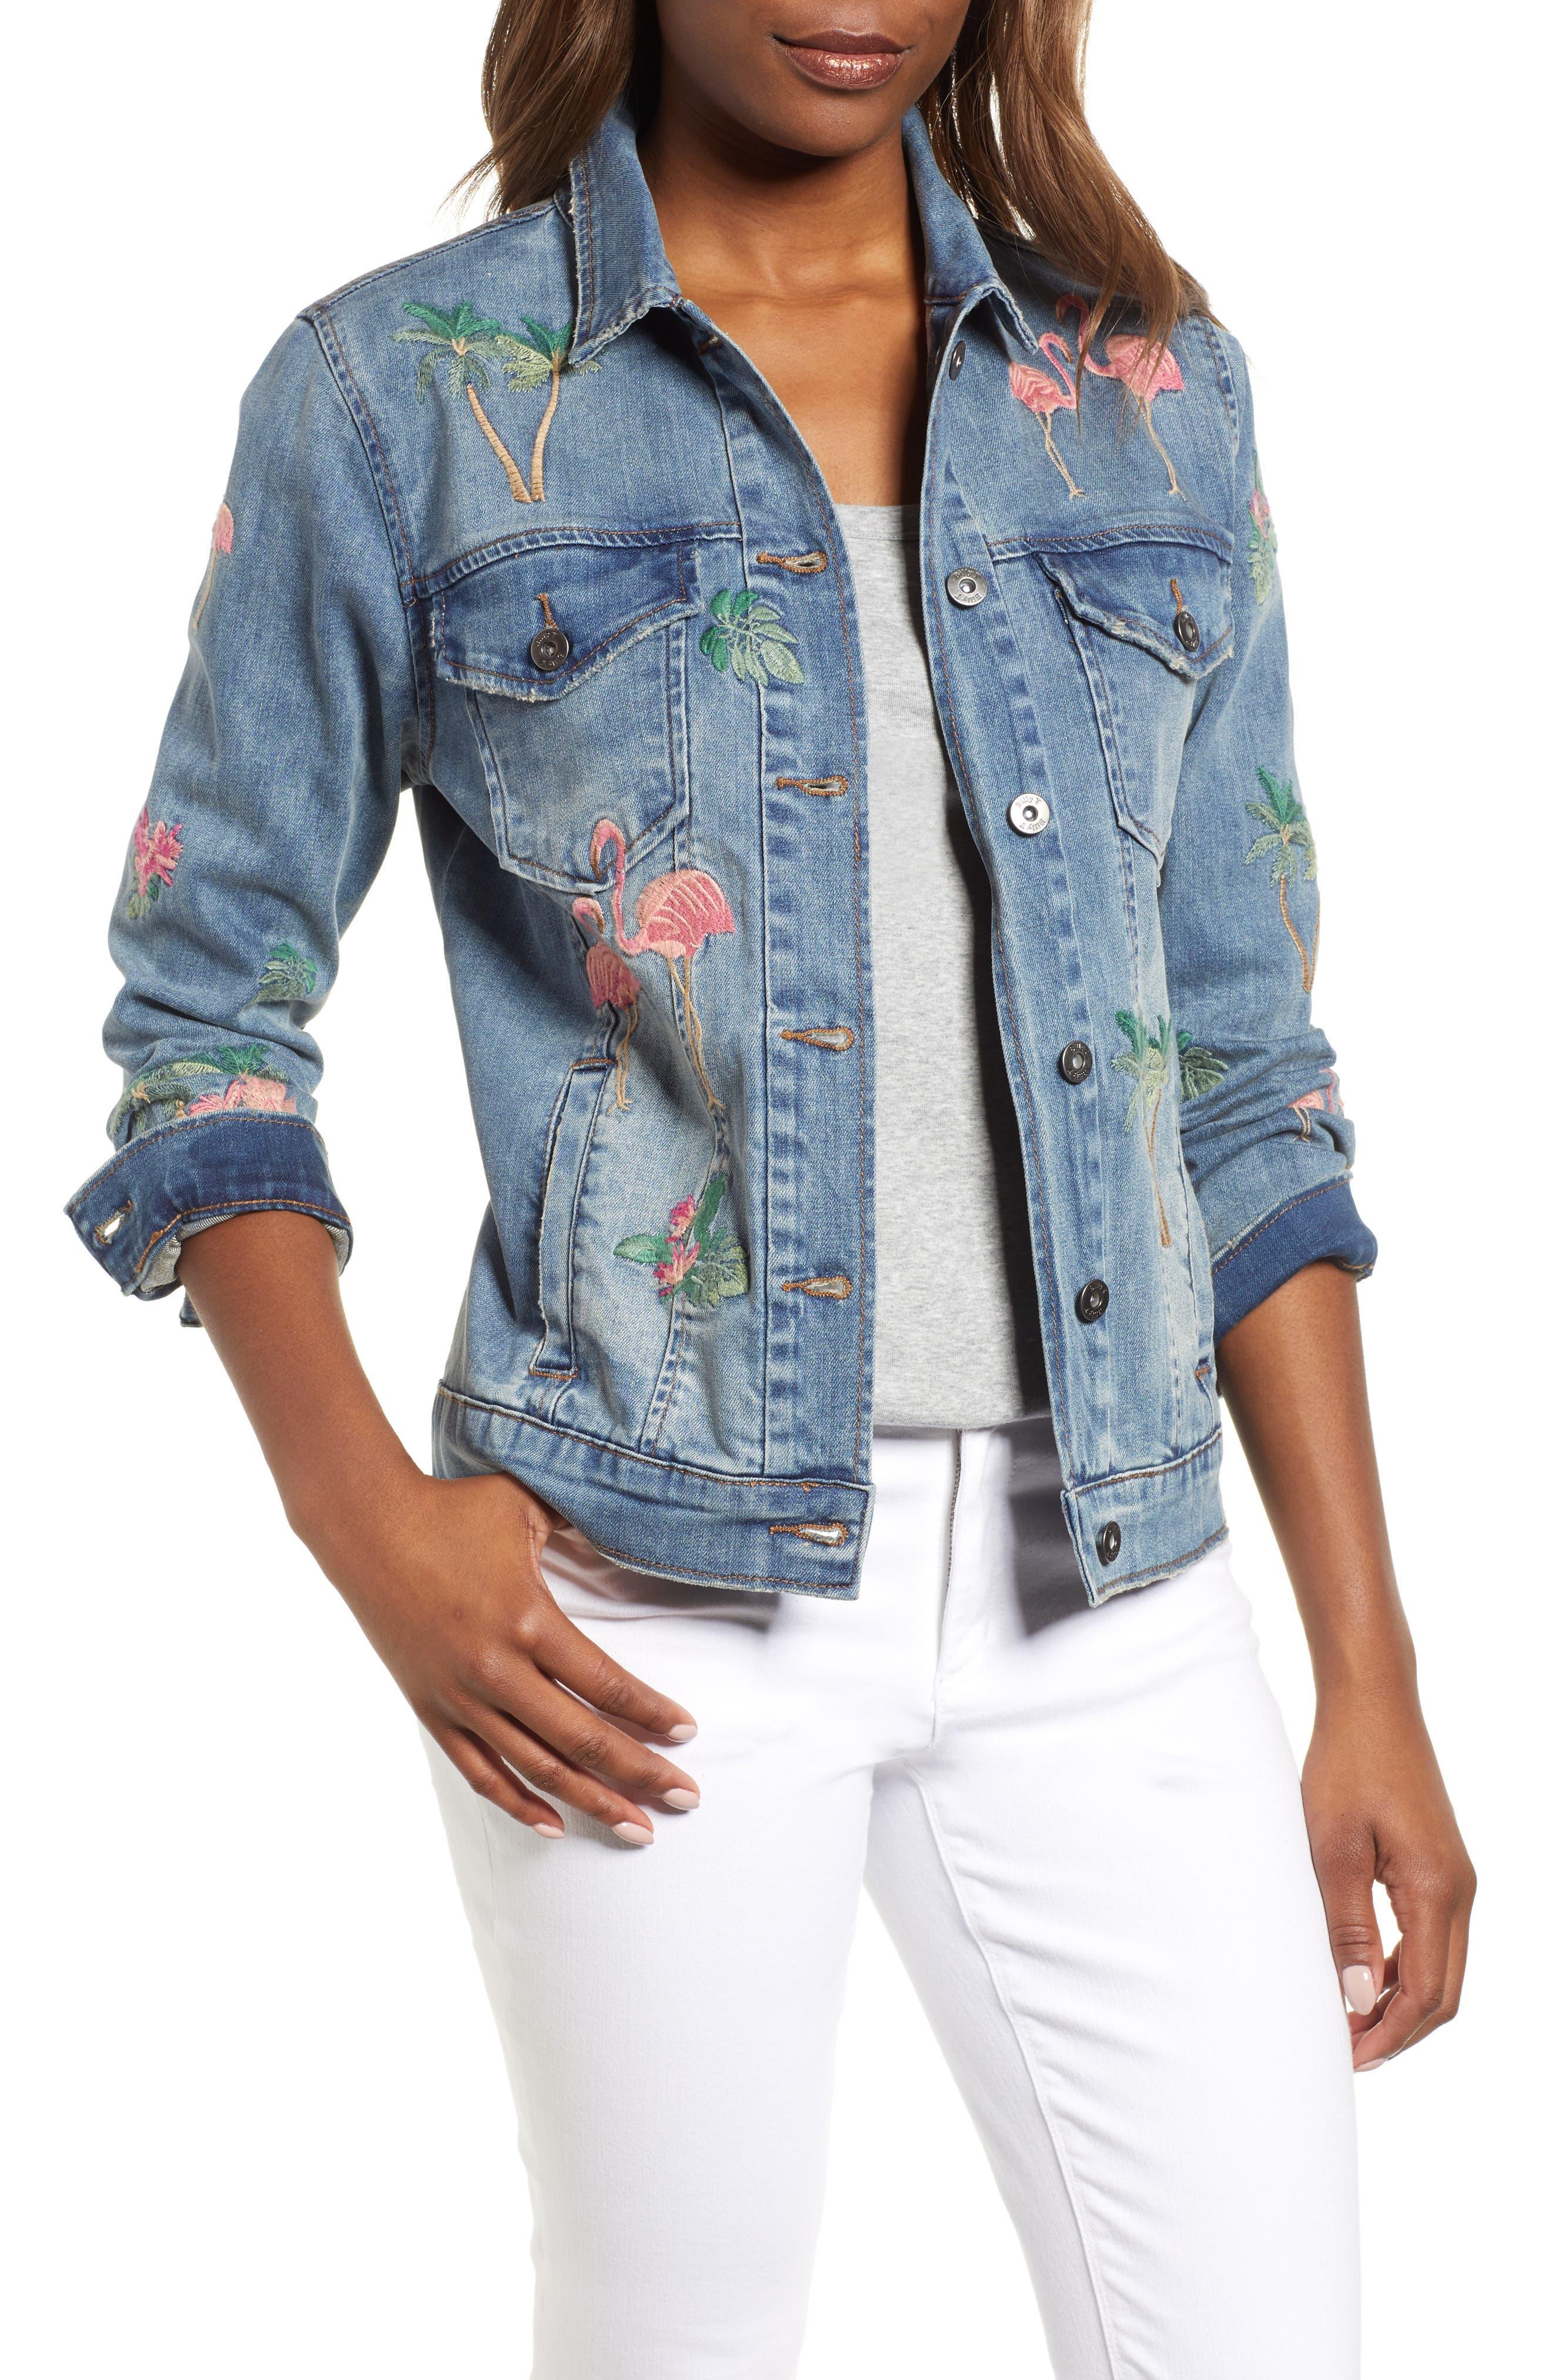 Flamingo Embroidered Denim Jacket,                         Main,                         color, Blue W/ Embroider